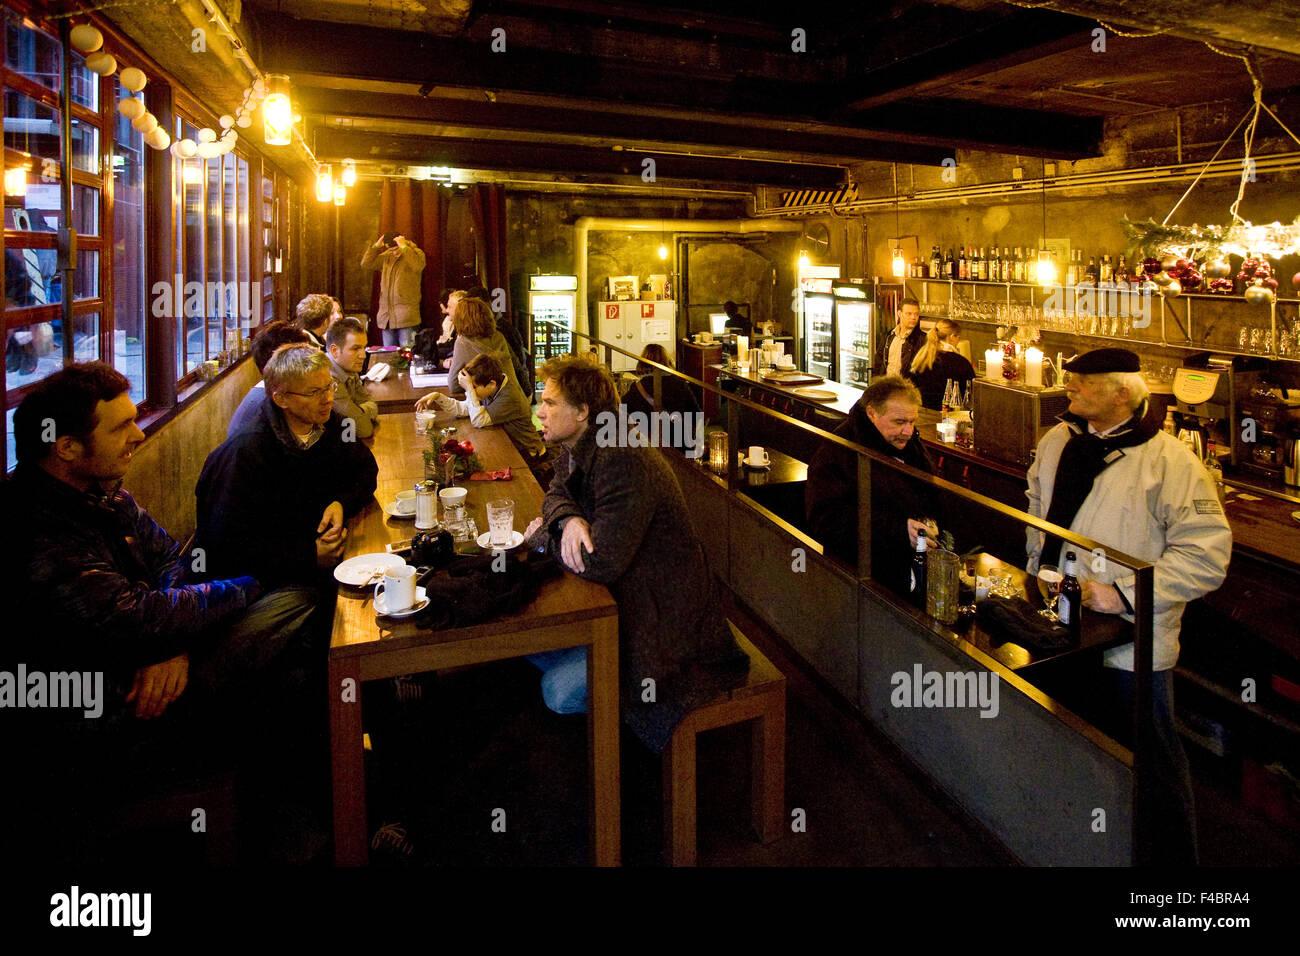 Cafe, Zollverein, Essen, Germany - Stock Image